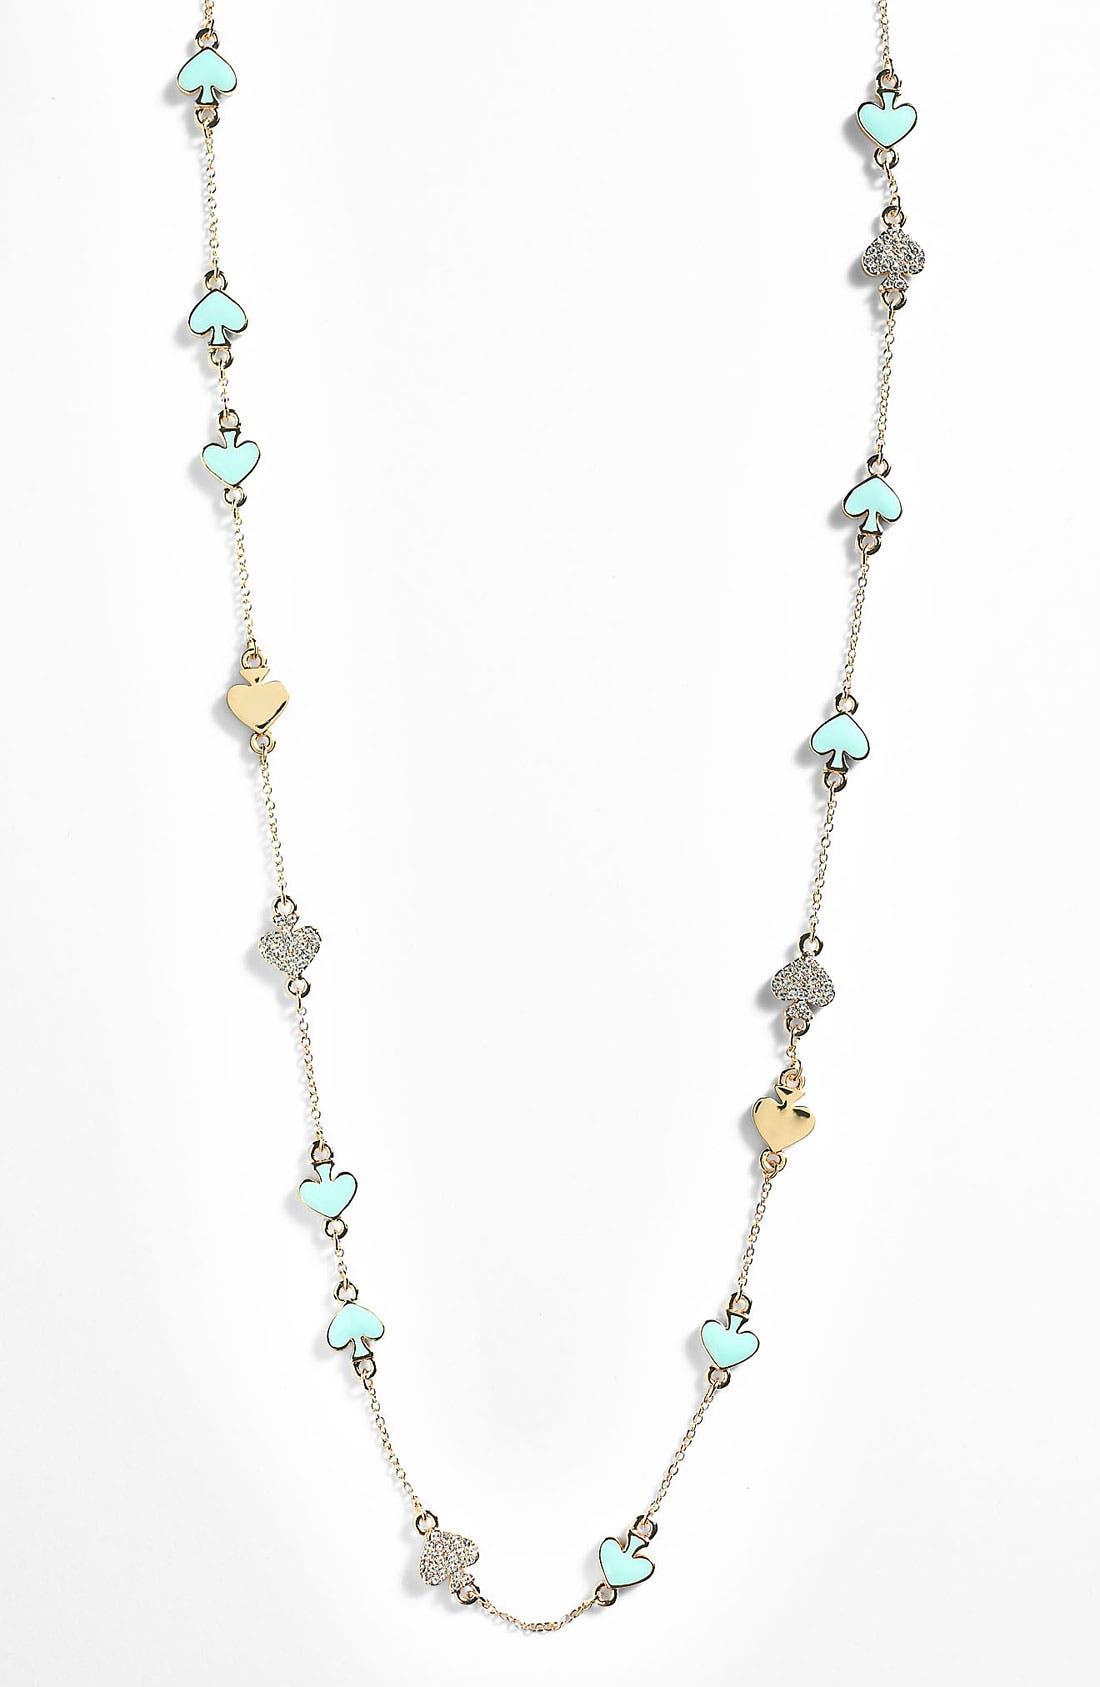 Main Image - kate spade new york 'spade to spade' long station necklace